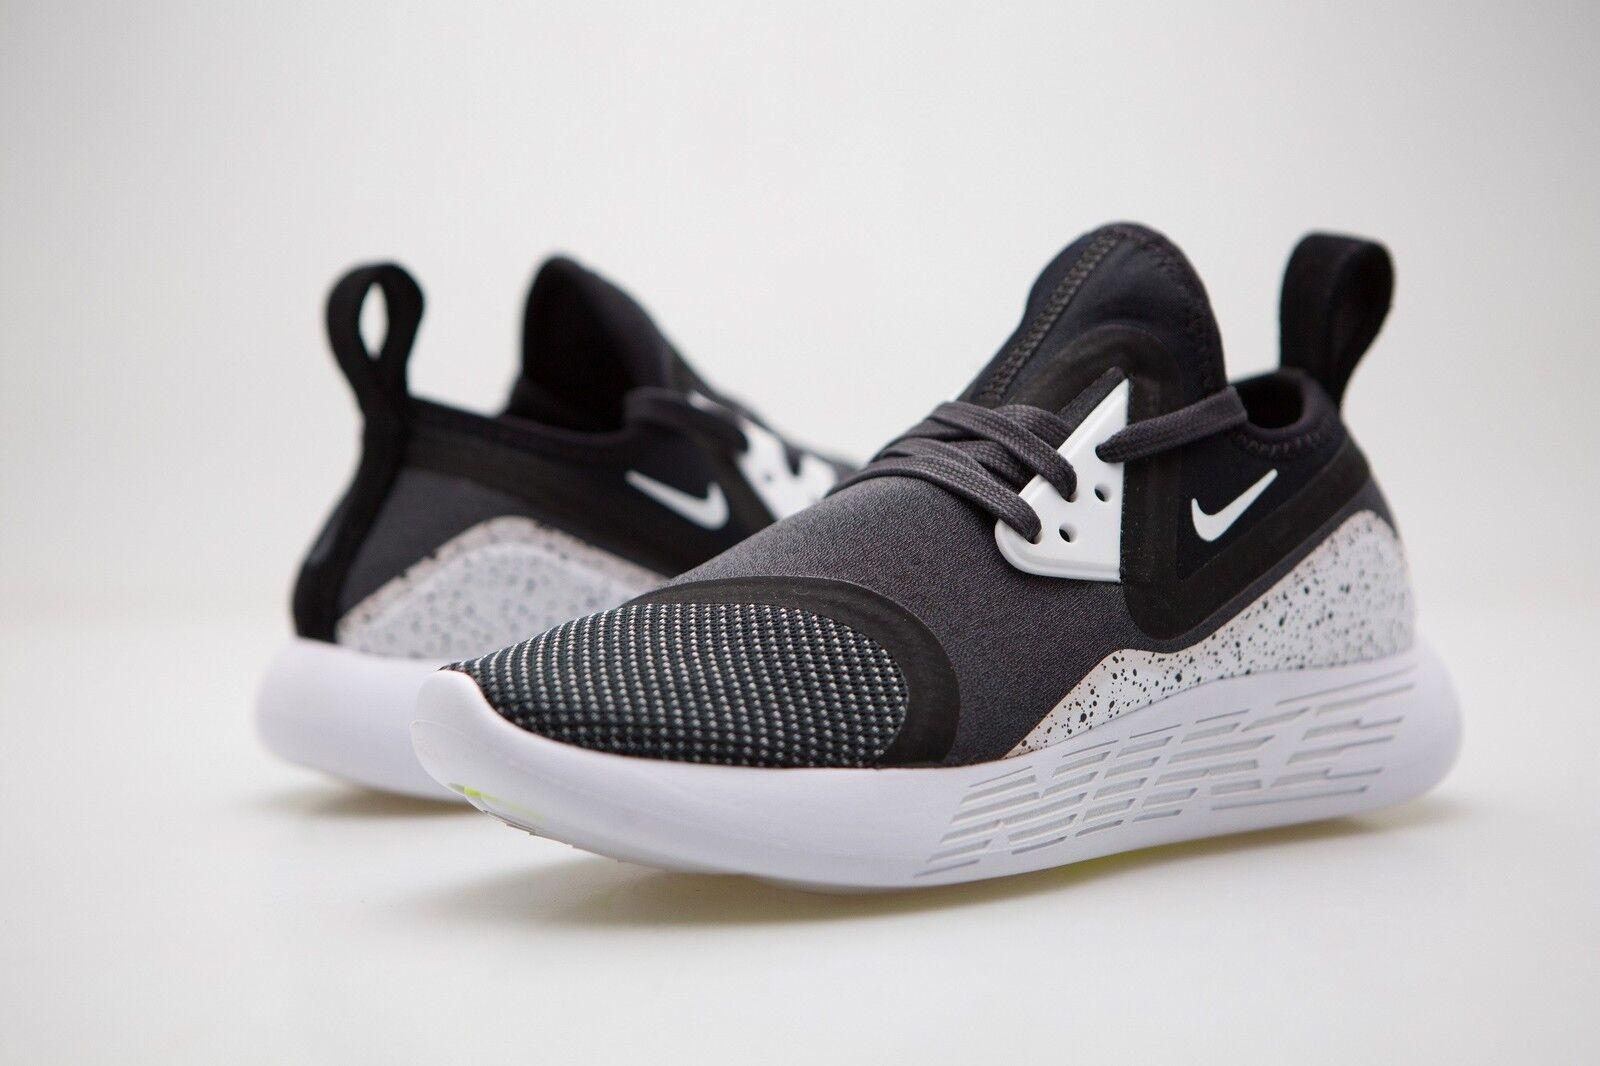 923285-999 Nike Women Lunarcharge Premium Le Black White